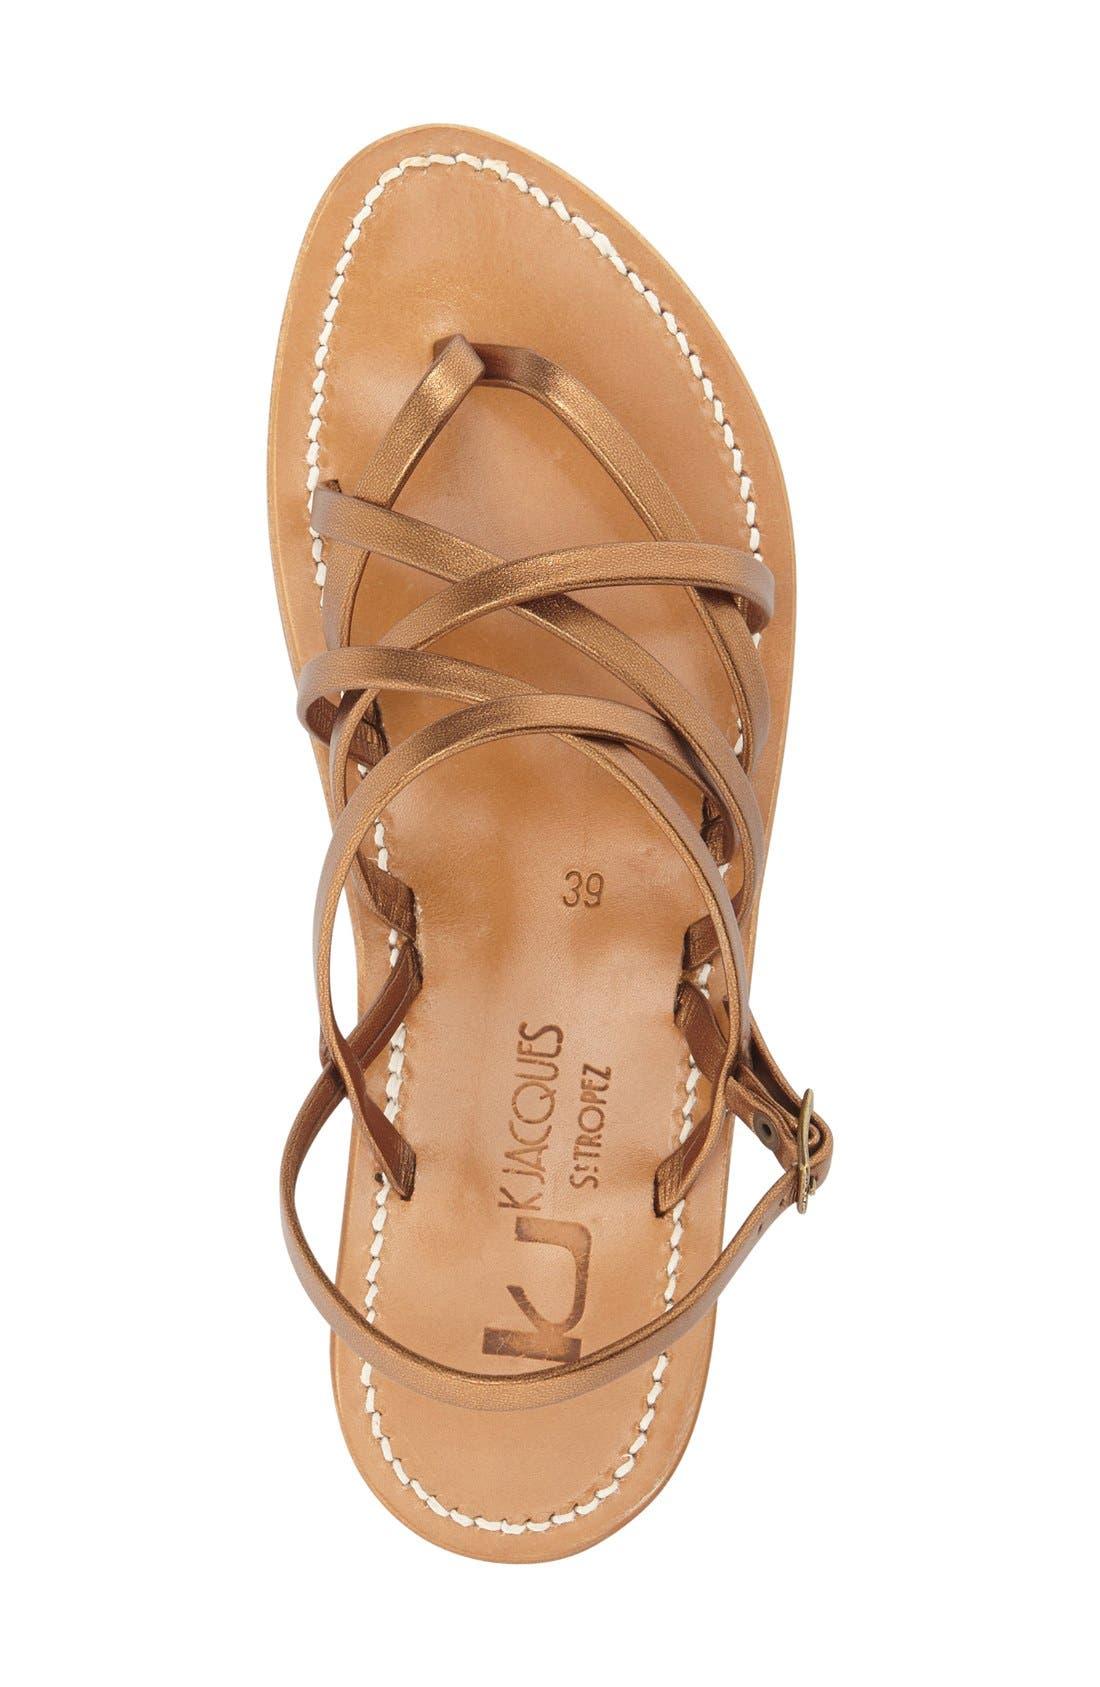 Alternate Image 3  - K.Jacques St. Tropez Strappy Flat Sandal (Women)